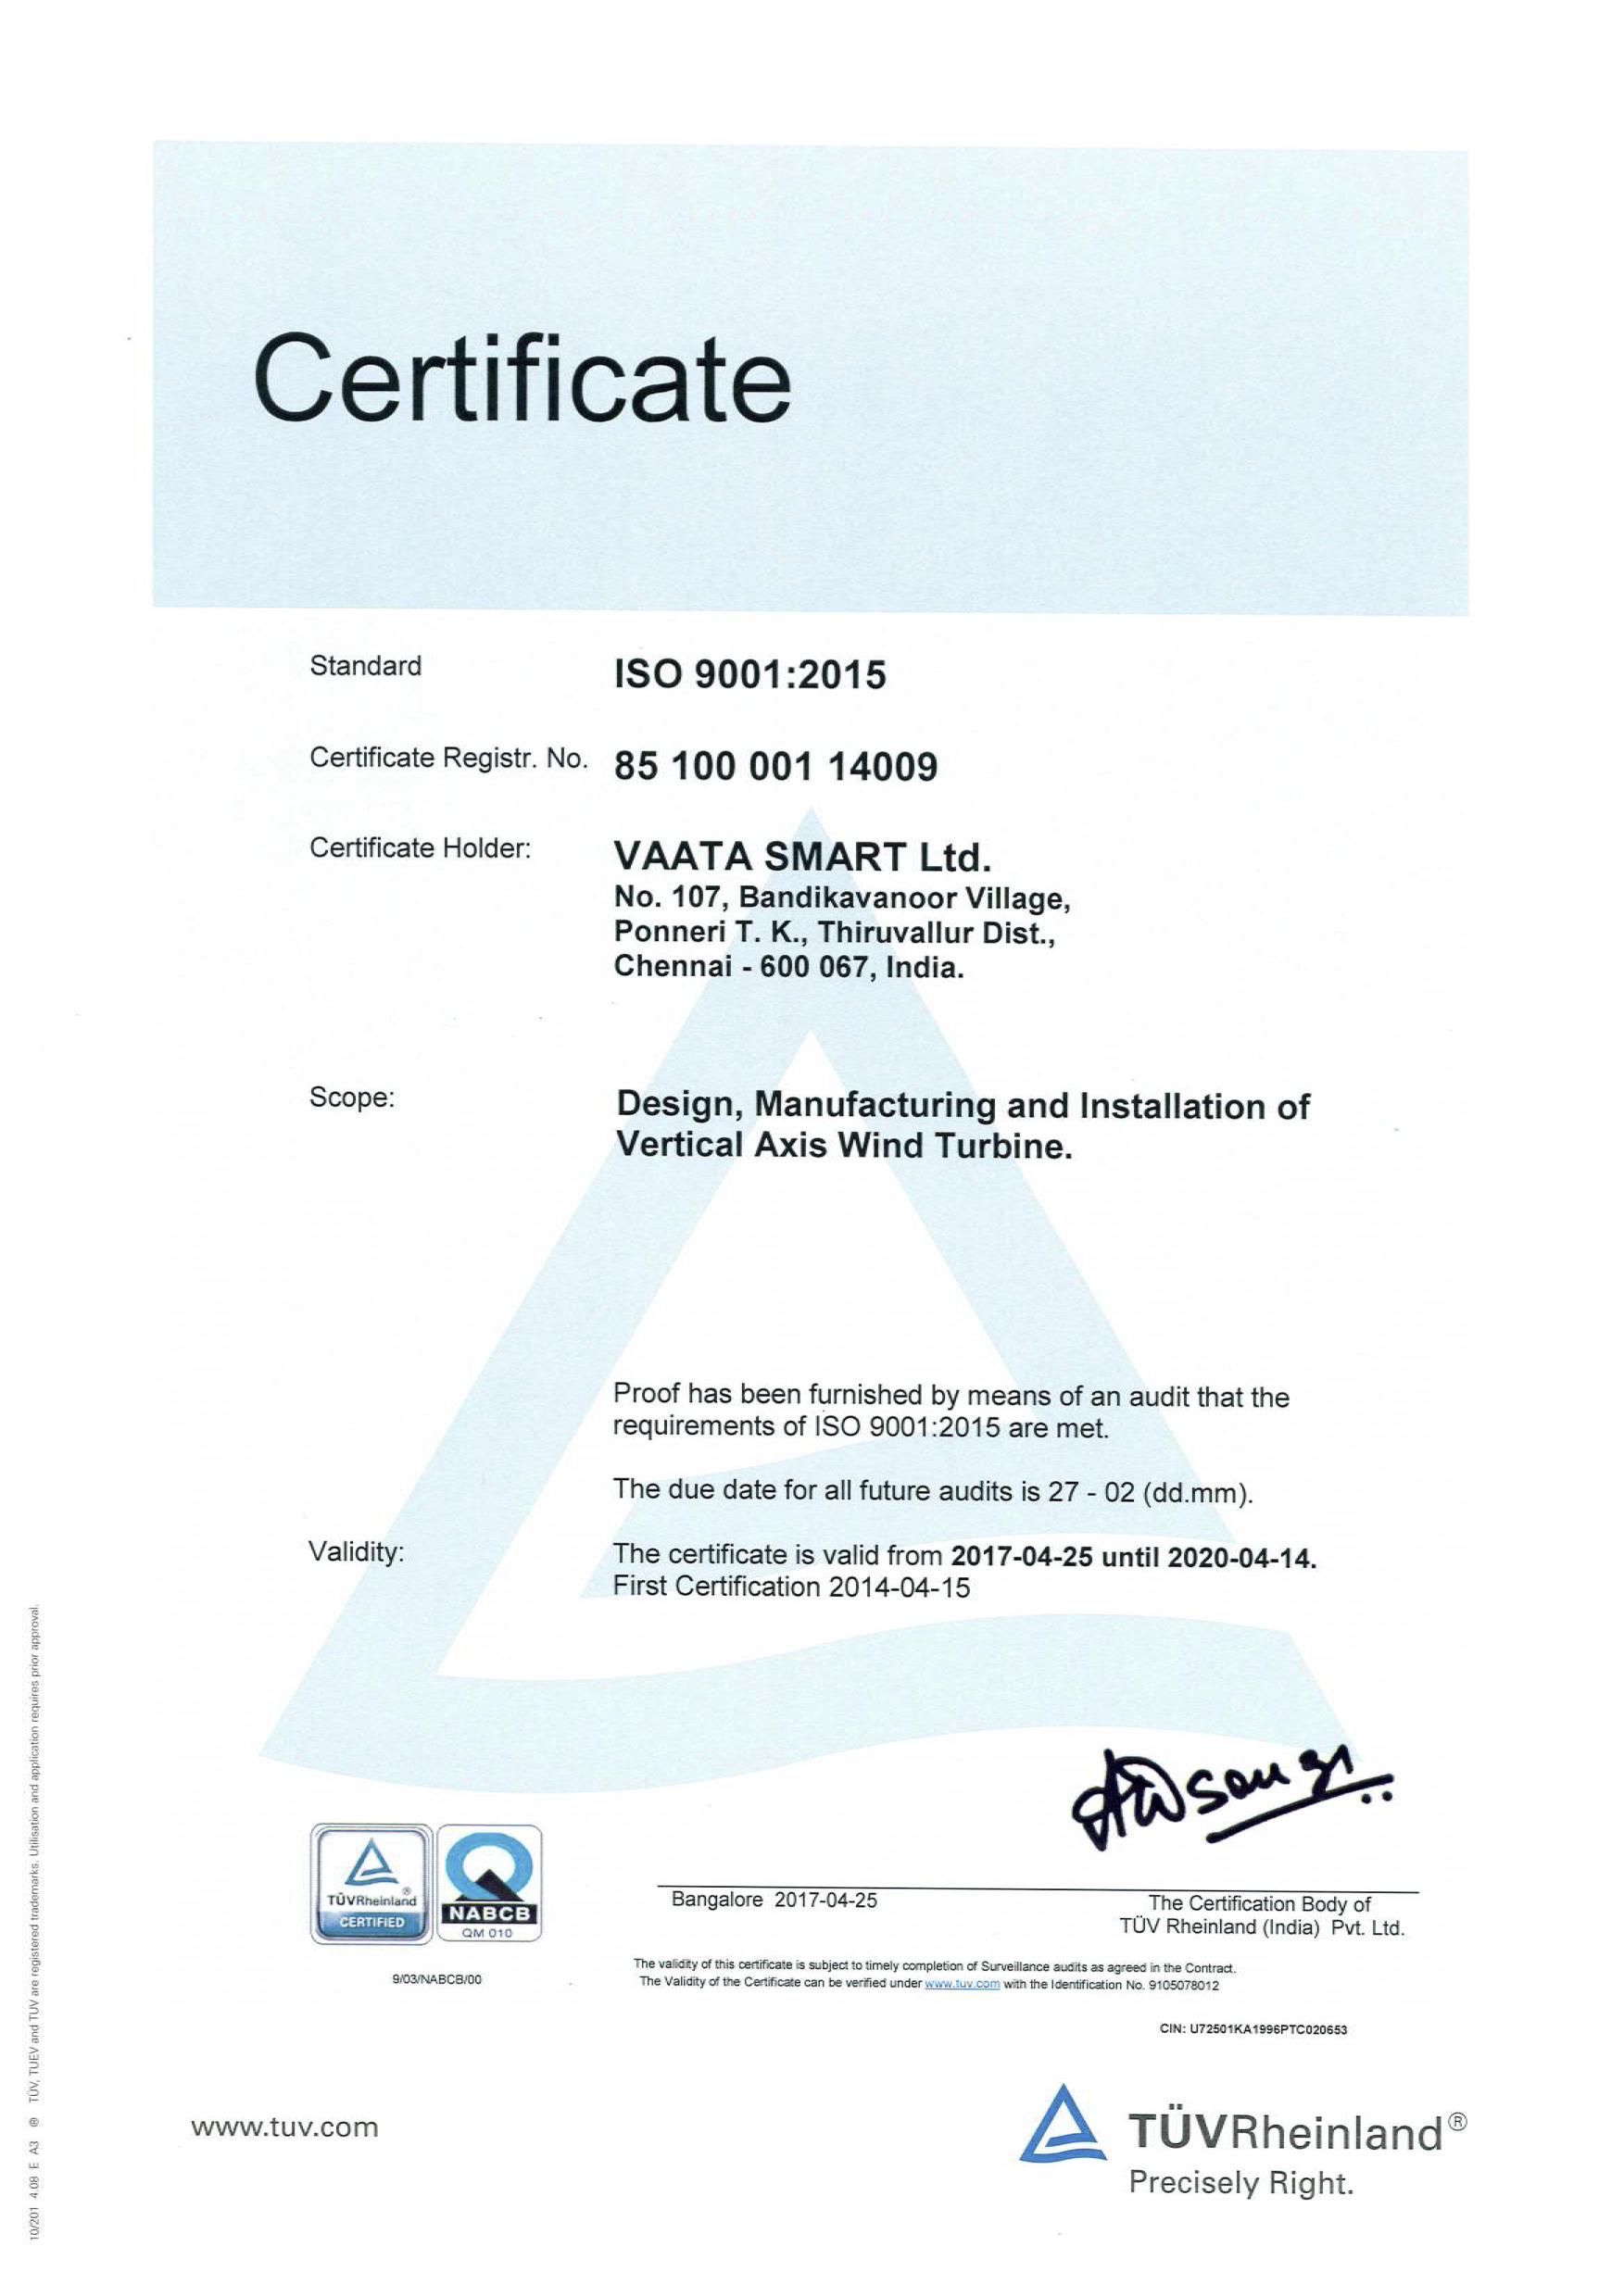 ISO 9001 2015 Certificate copy.jpg